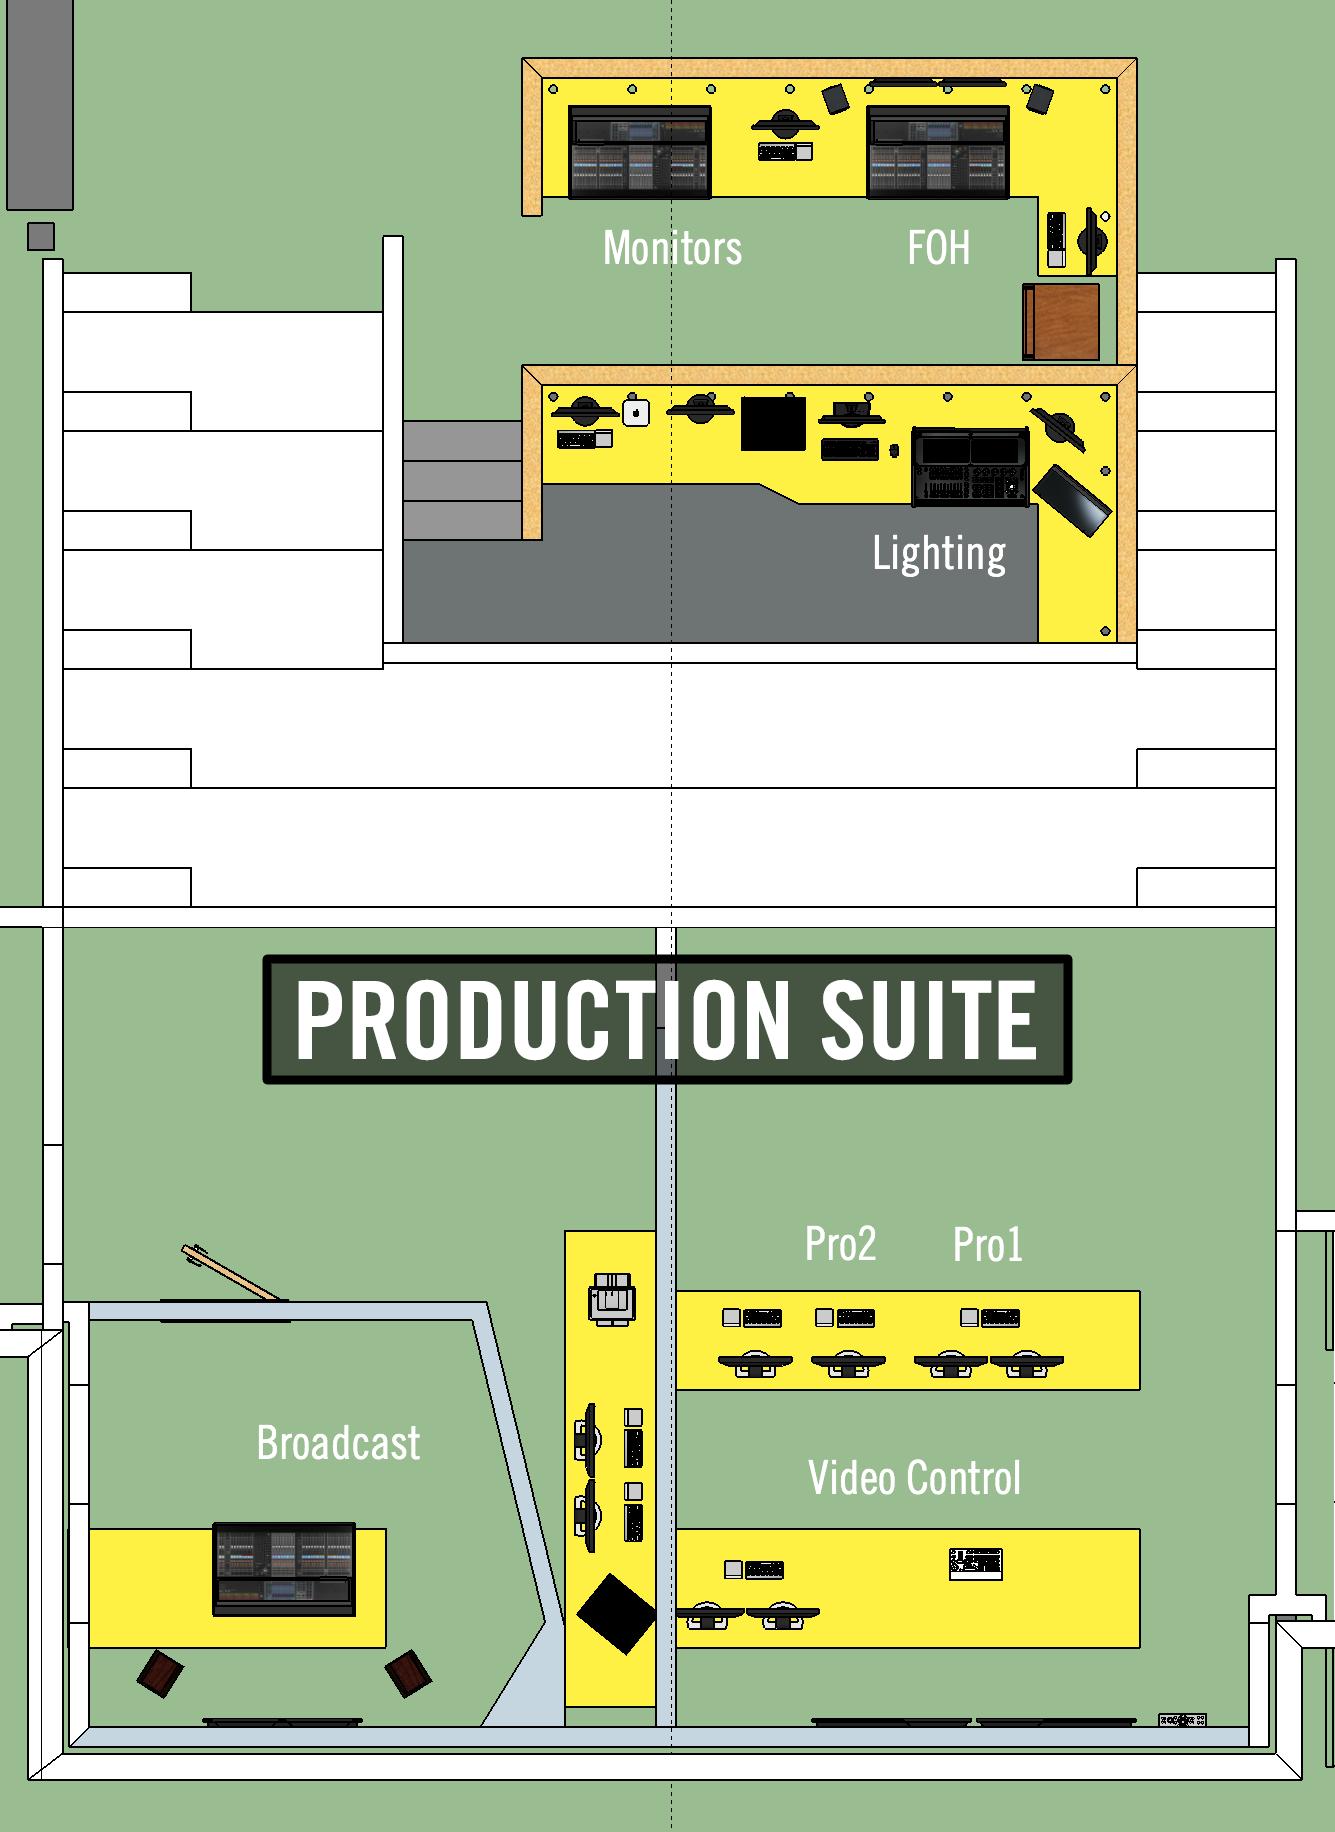 Sandals Production Layout